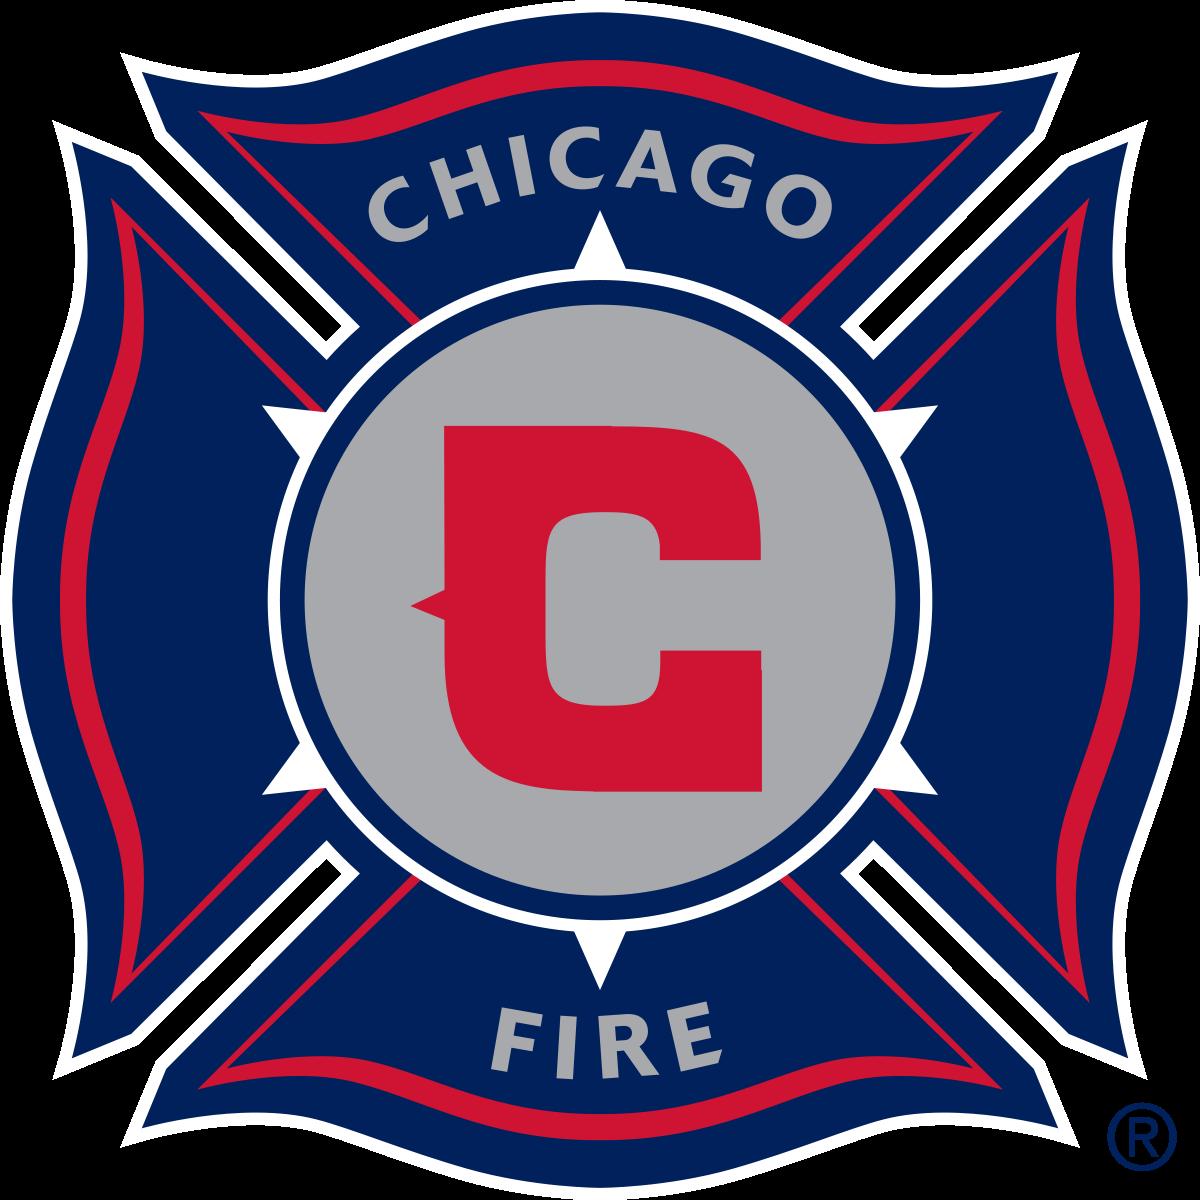 Chicago Fire Soccer Club.